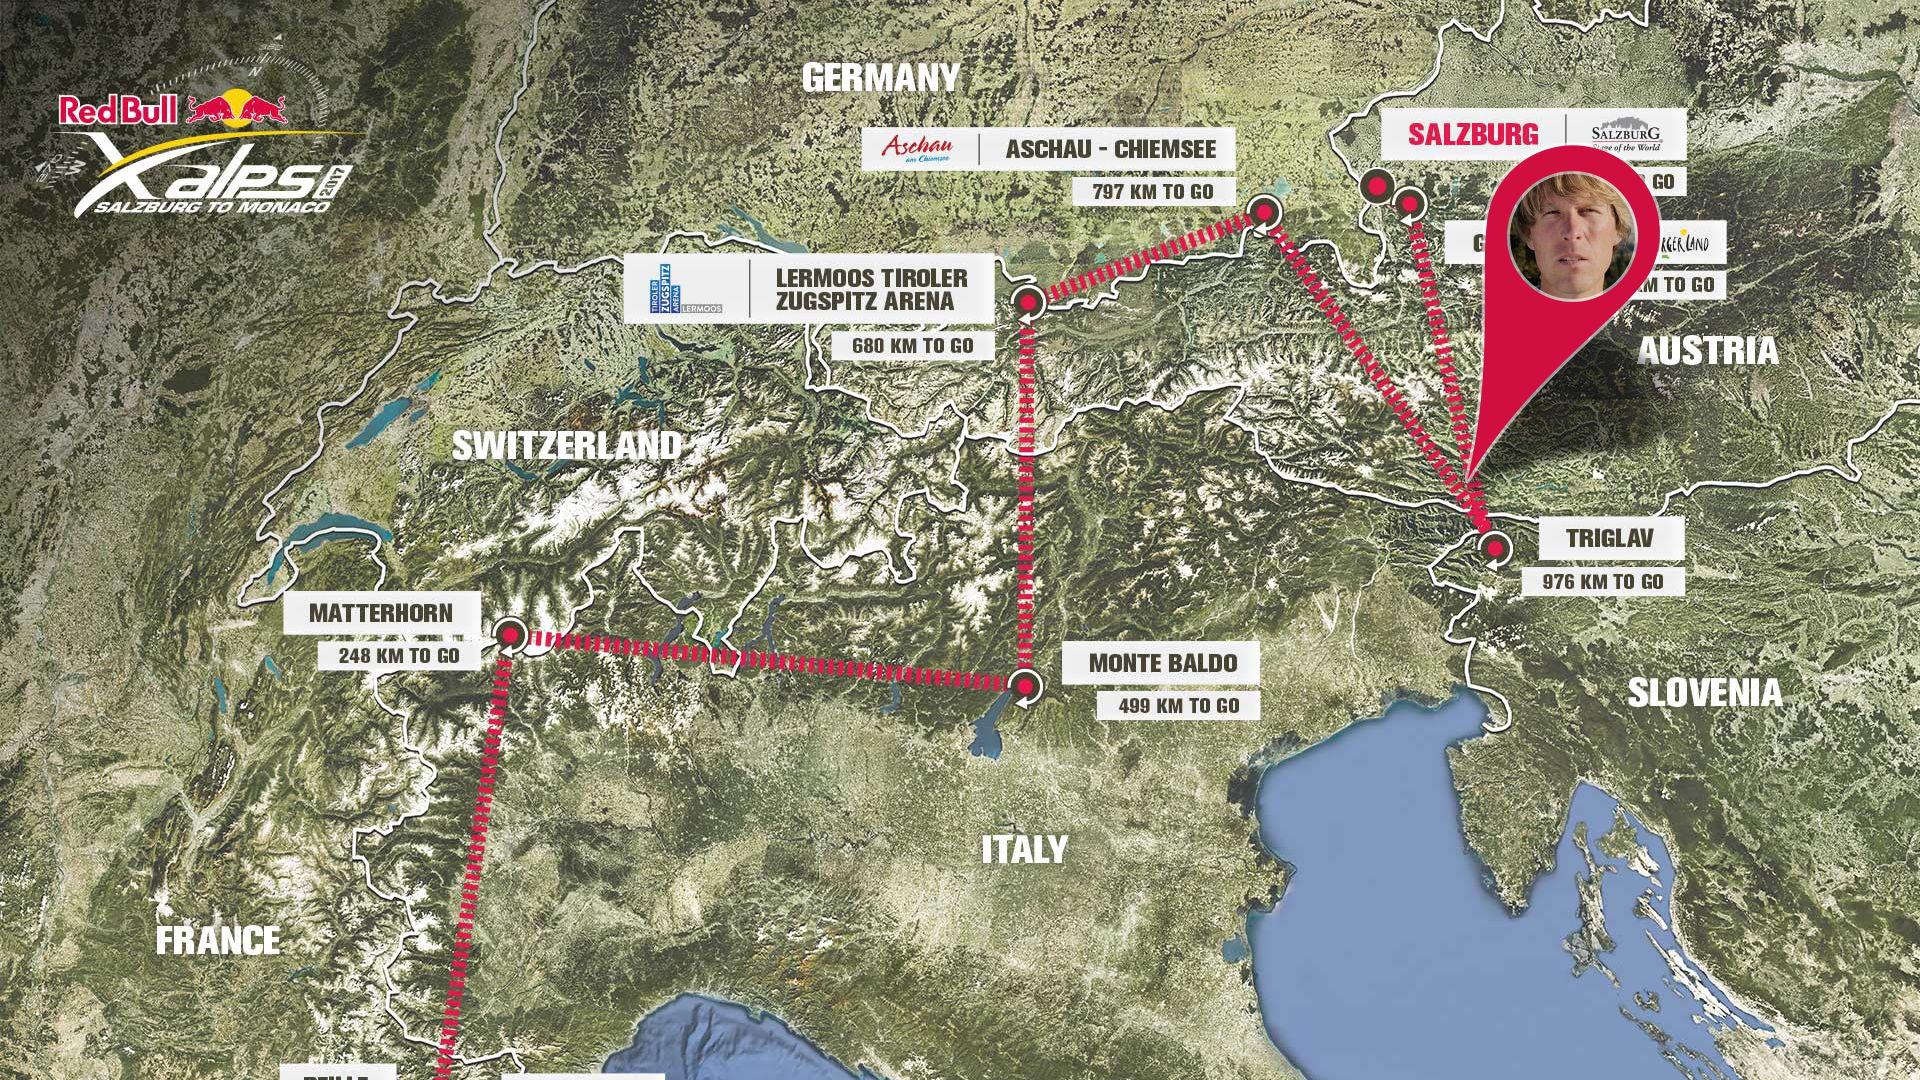 Mapa trasy wyścigu RedBull X-Alps